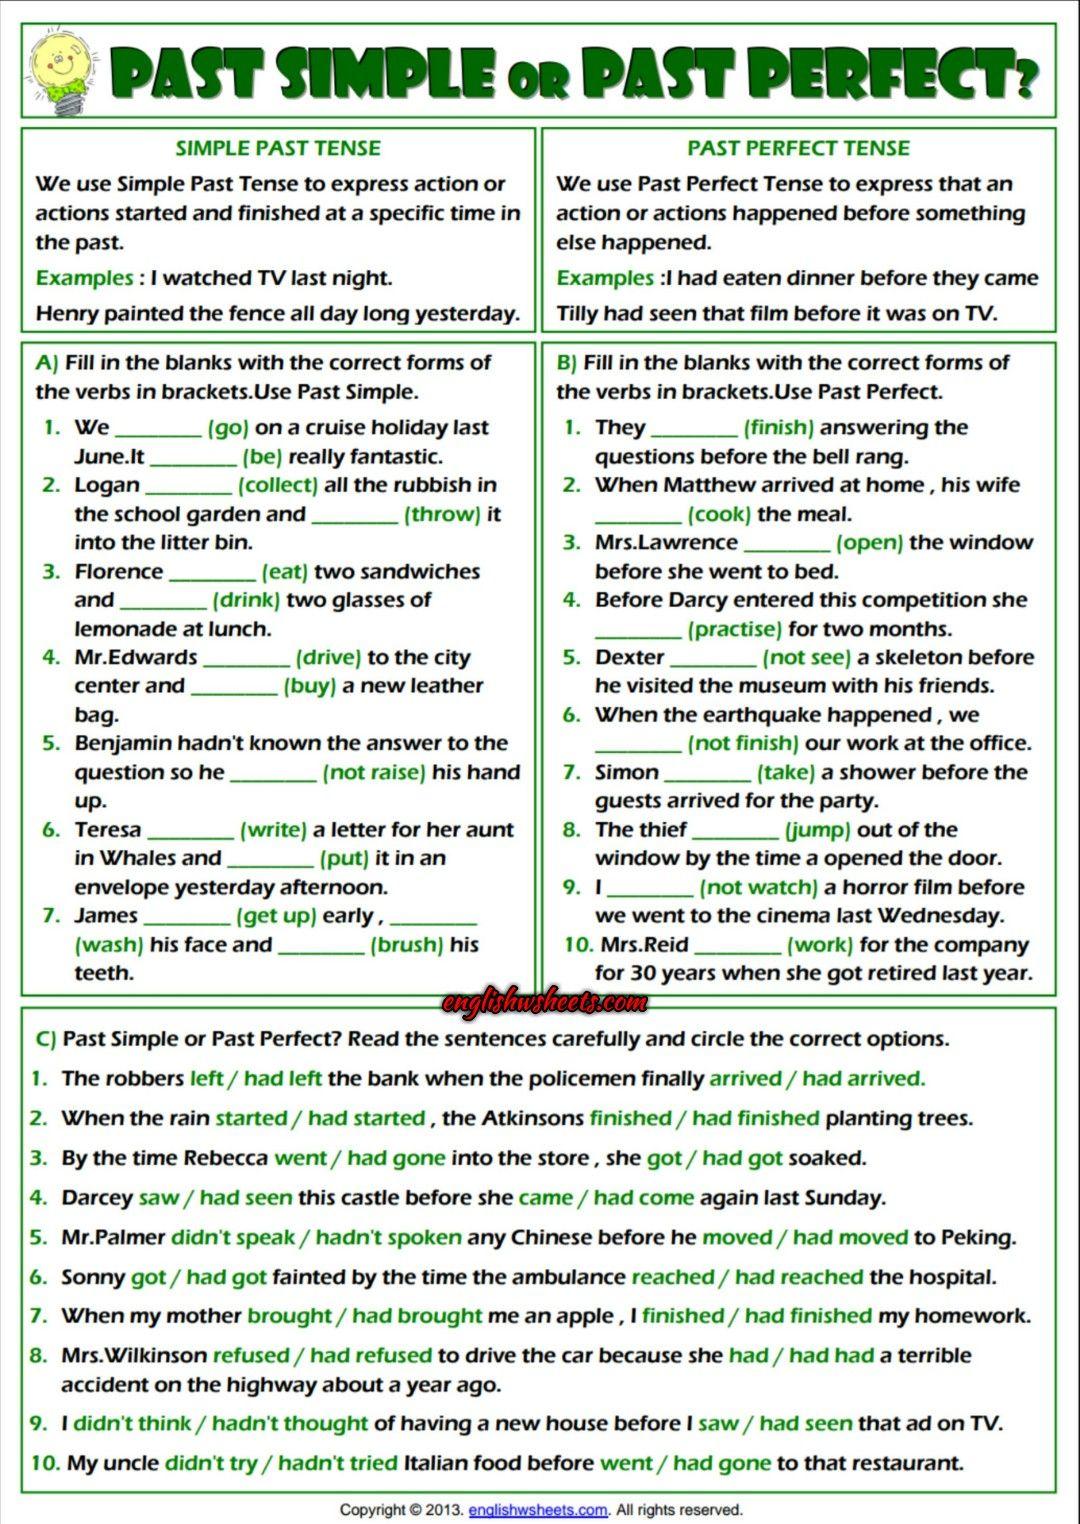 Solving Polynomials Worksheet Word Simple Past Or Past Perfect Esl Exercises Worksheet  Esl  Grammar Exercises For Kids Worksheet Word with Esl Questions Worksheets Simple Past Or Past Perfect Esl Exercises Worksheet Common Core Math Word Problems 5th Grade Worksheets Pdf